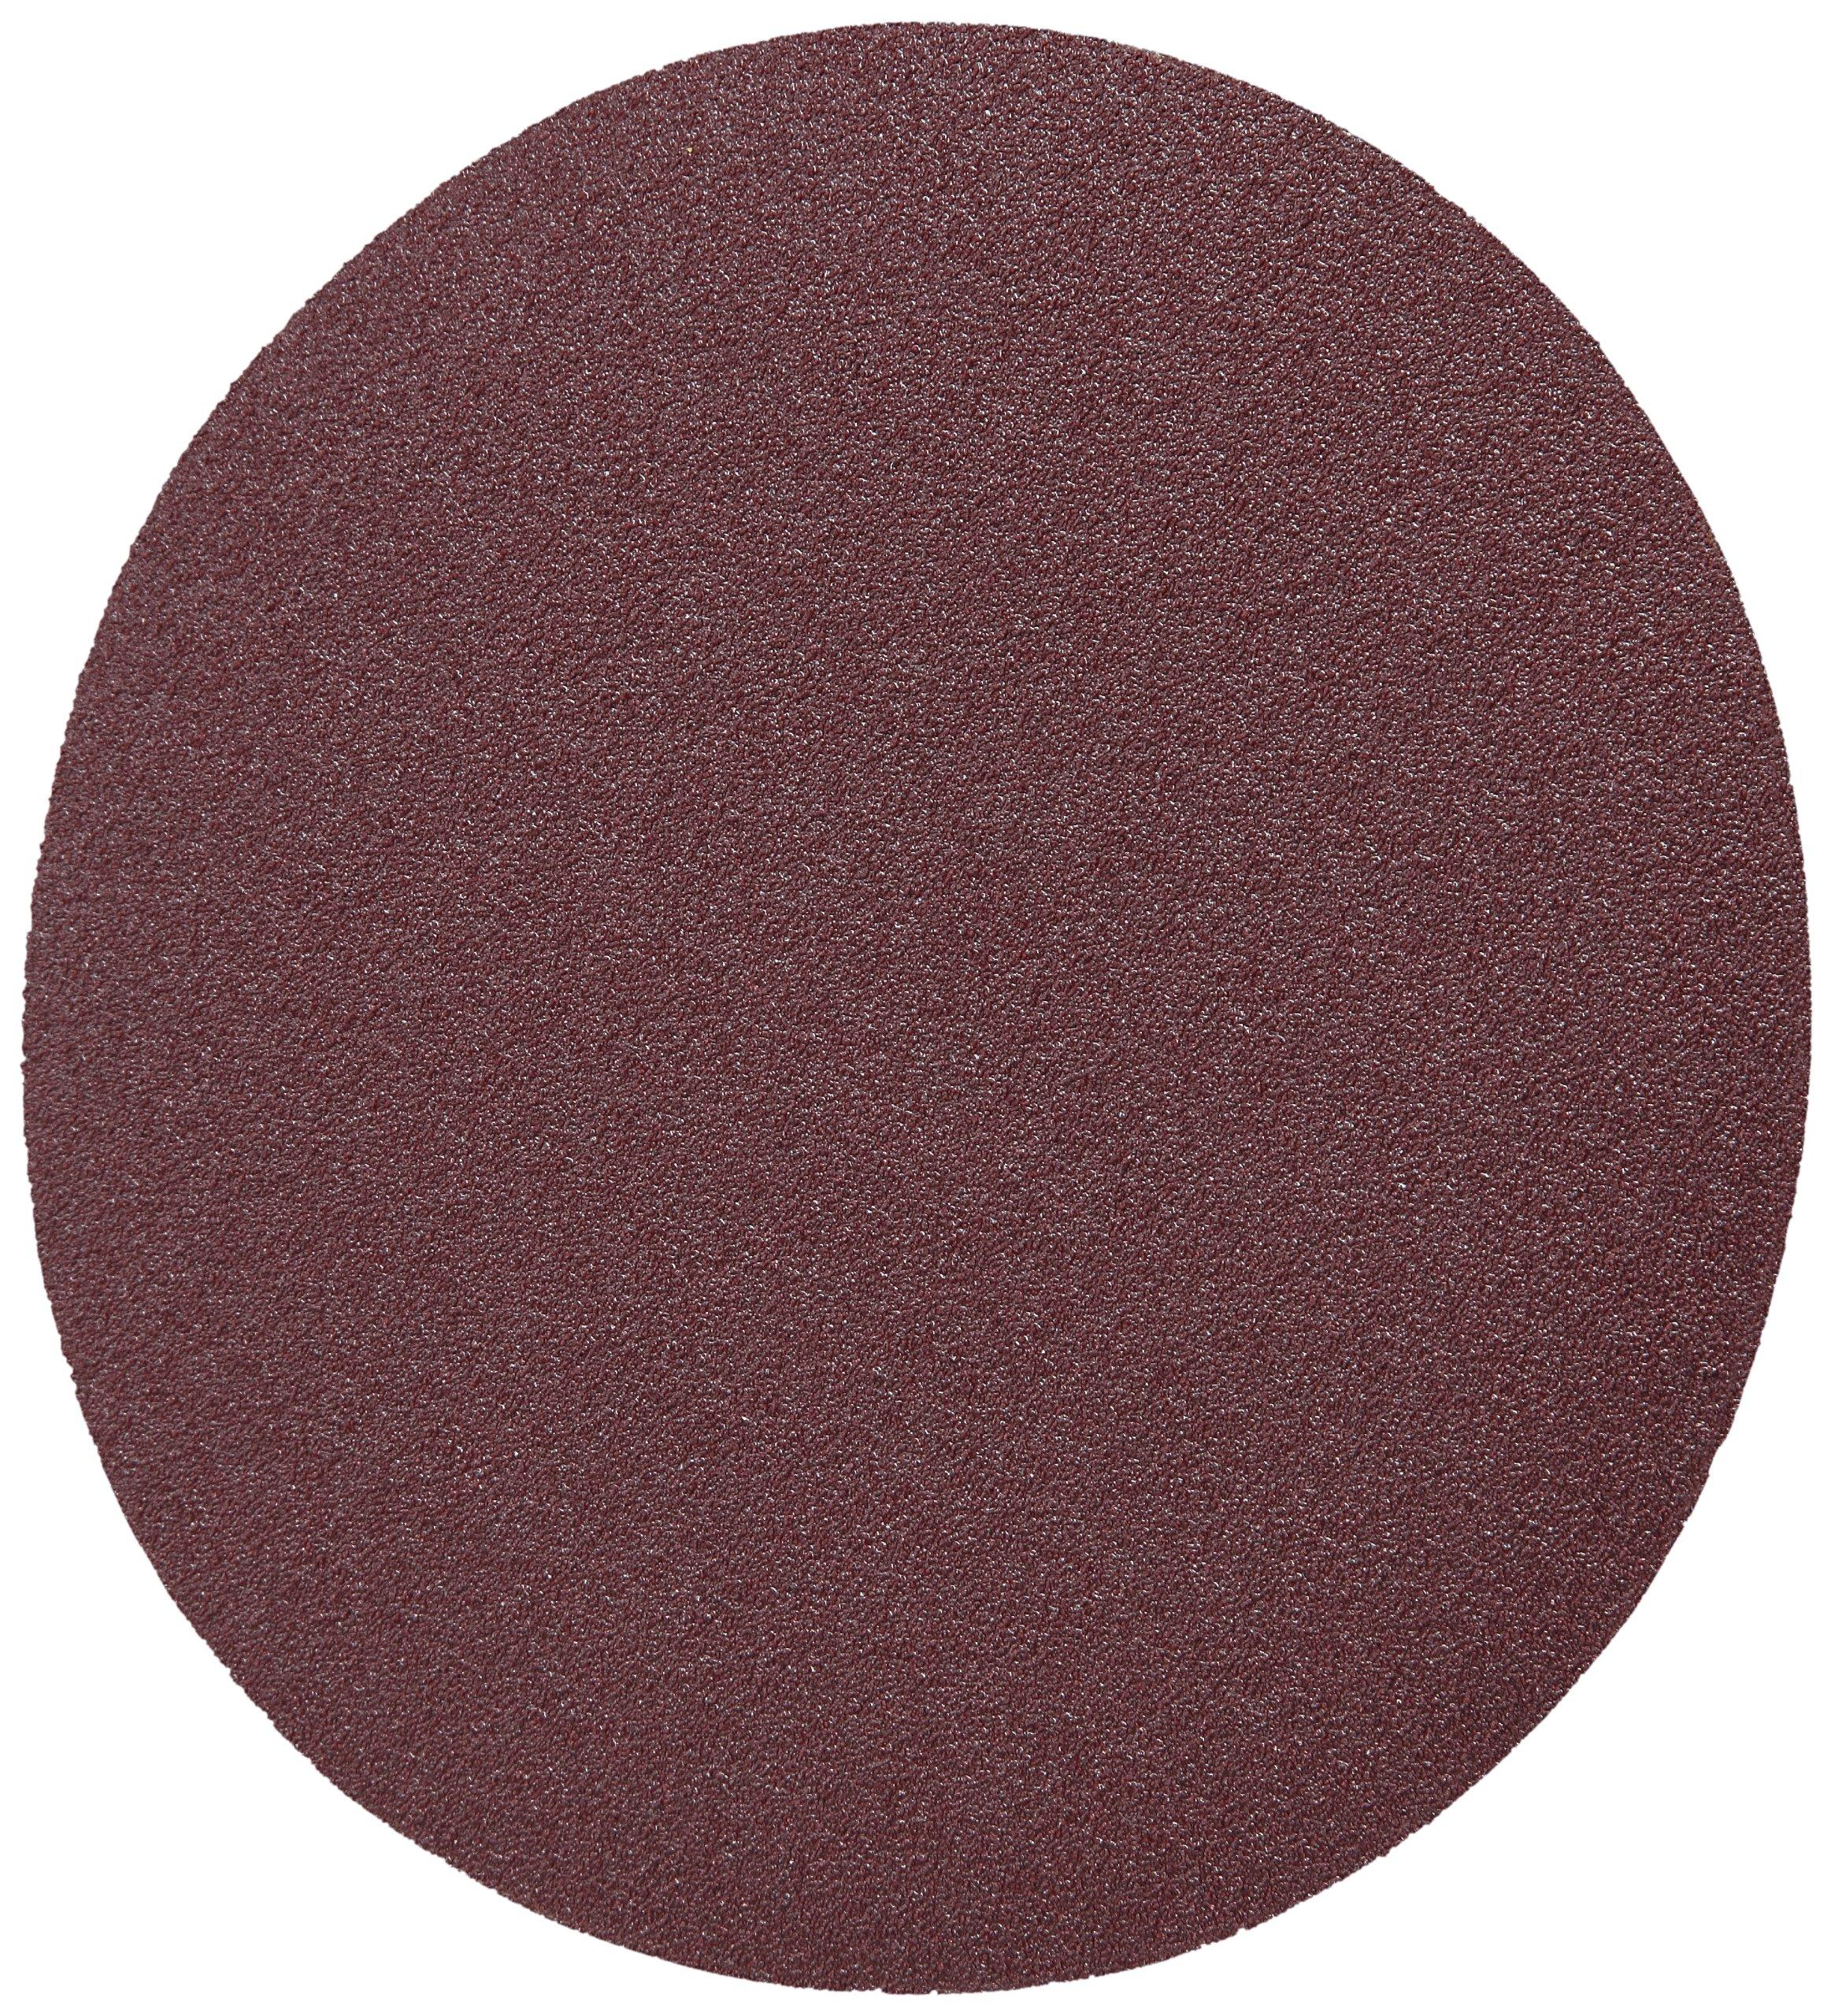 3M Stikit  Cloth Disc 202DZ, J-Weight Cloth, PSA Attachment, Aluminum Oxide, 5'' Diameter, 80 Grit (Pack of 50)